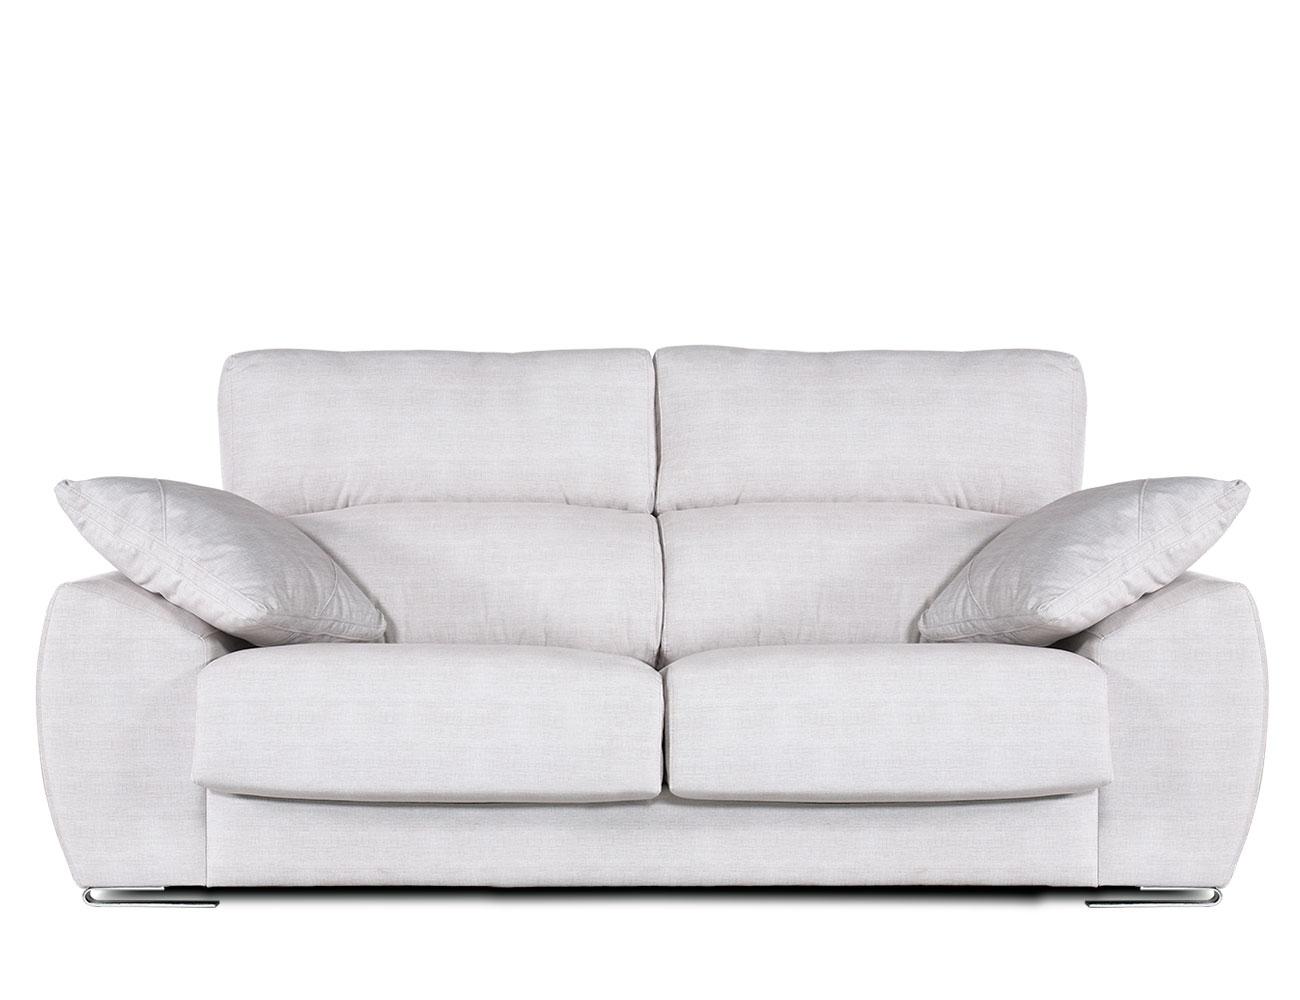 Sofa moderno 3plazas1